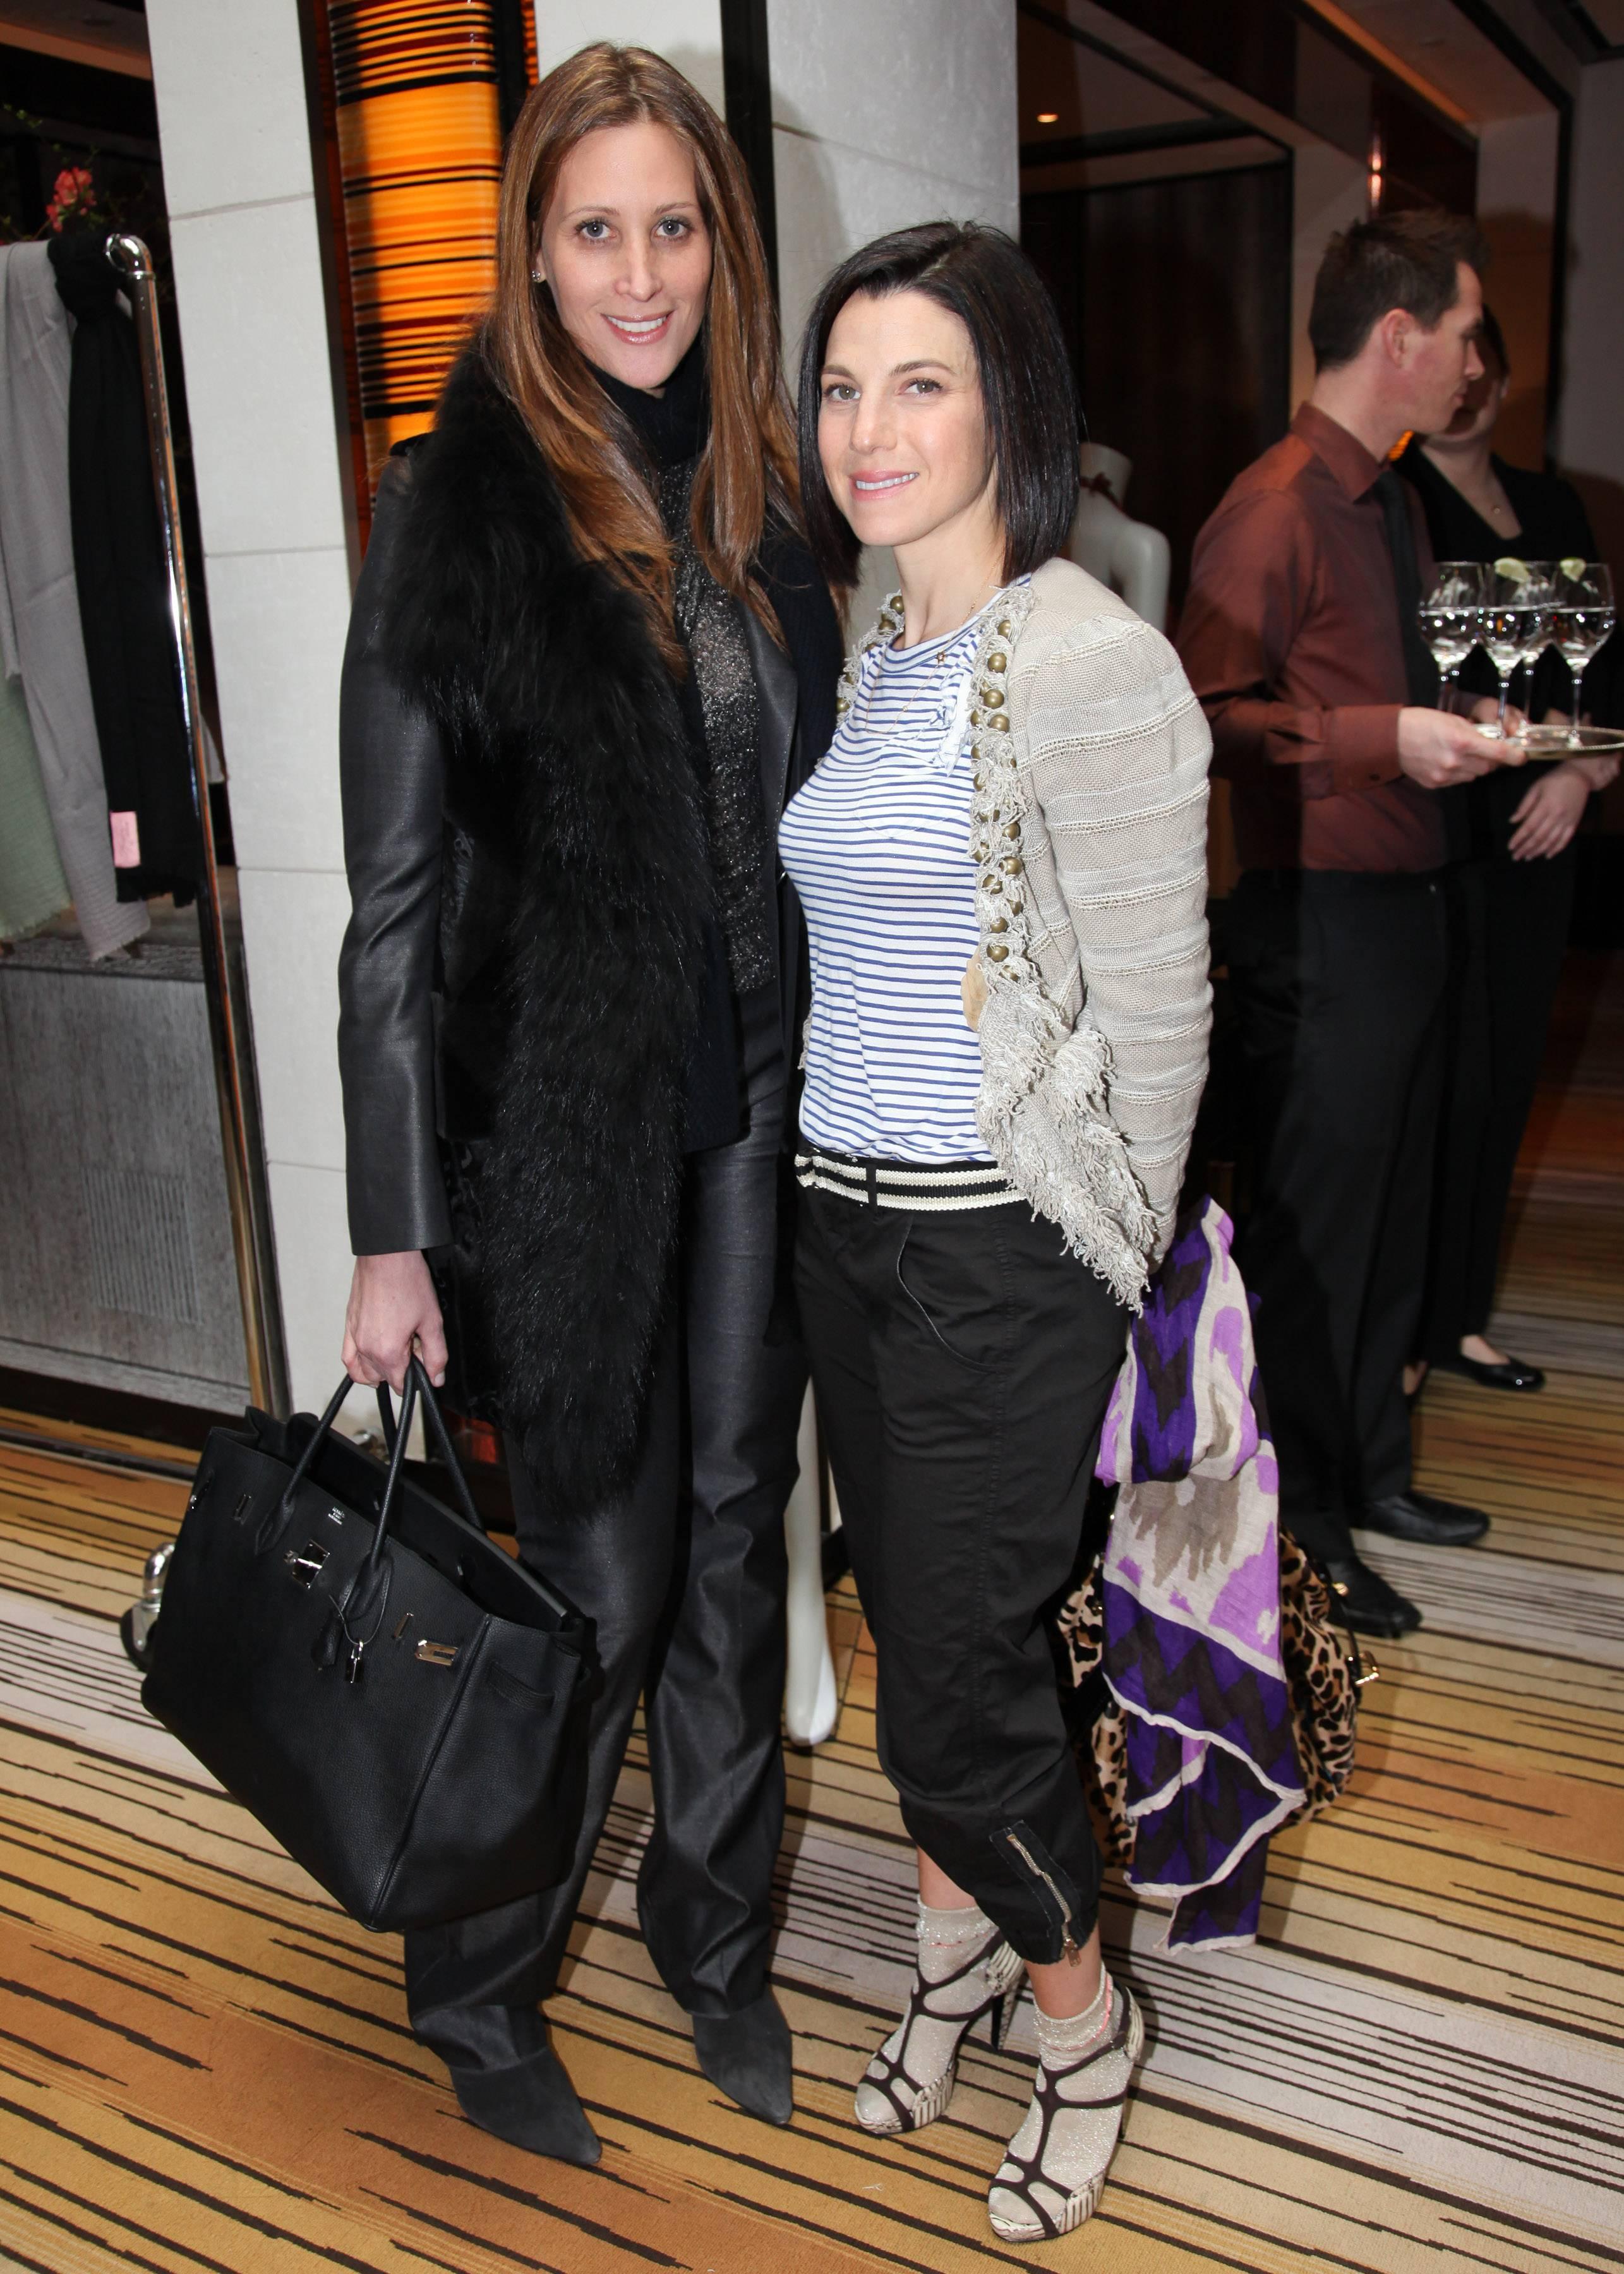 Stephanie Winston Wolkoff, Jessica Seinfeld Theodora & Callum event benefitting Baby Buggy